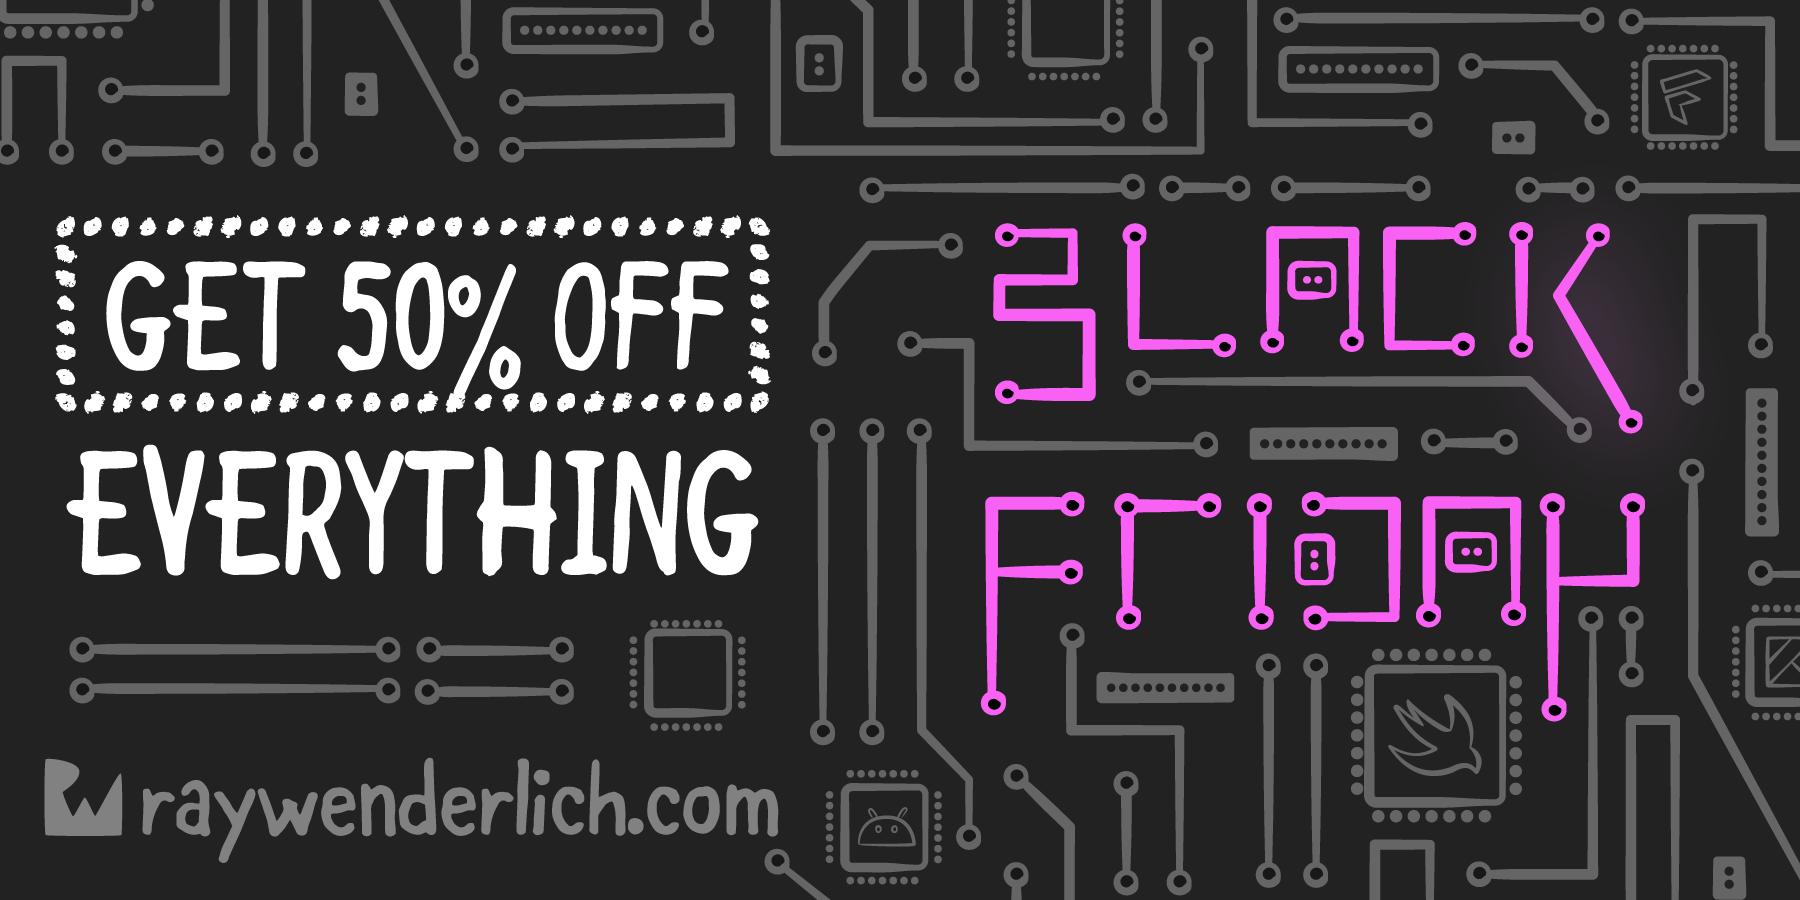 raywenderlich.com Black Friday Sale: 50% Off Store-Wide! [FREE]